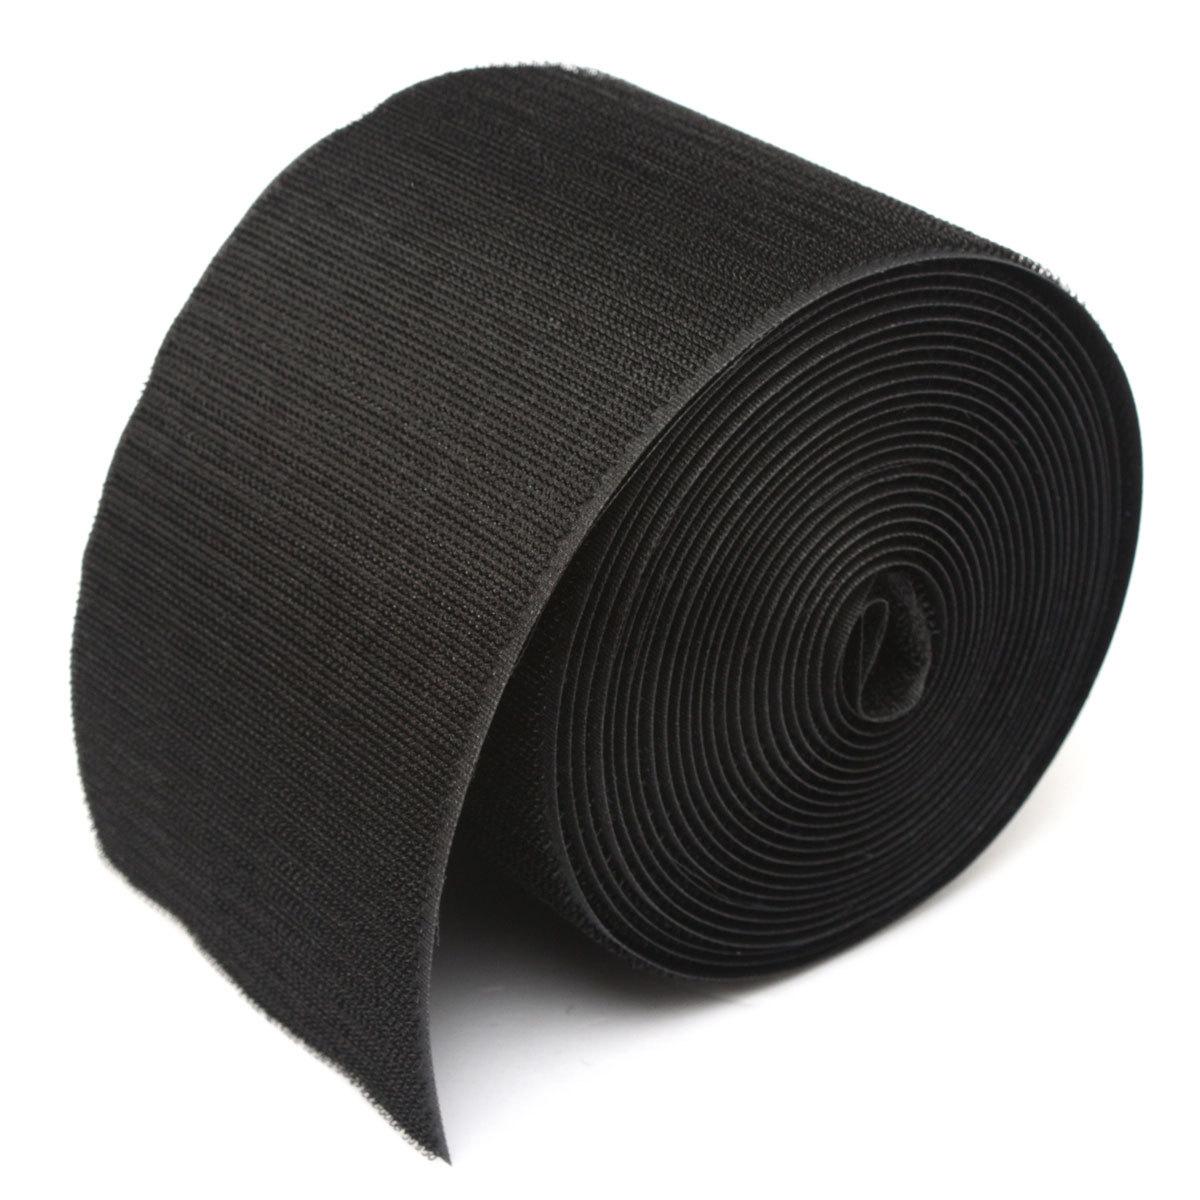 5m length 100mm width floor cable wrap tape carpet nylon wire organiser cover ebay. Black Bedroom Furniture Sets. Home Design Ideas